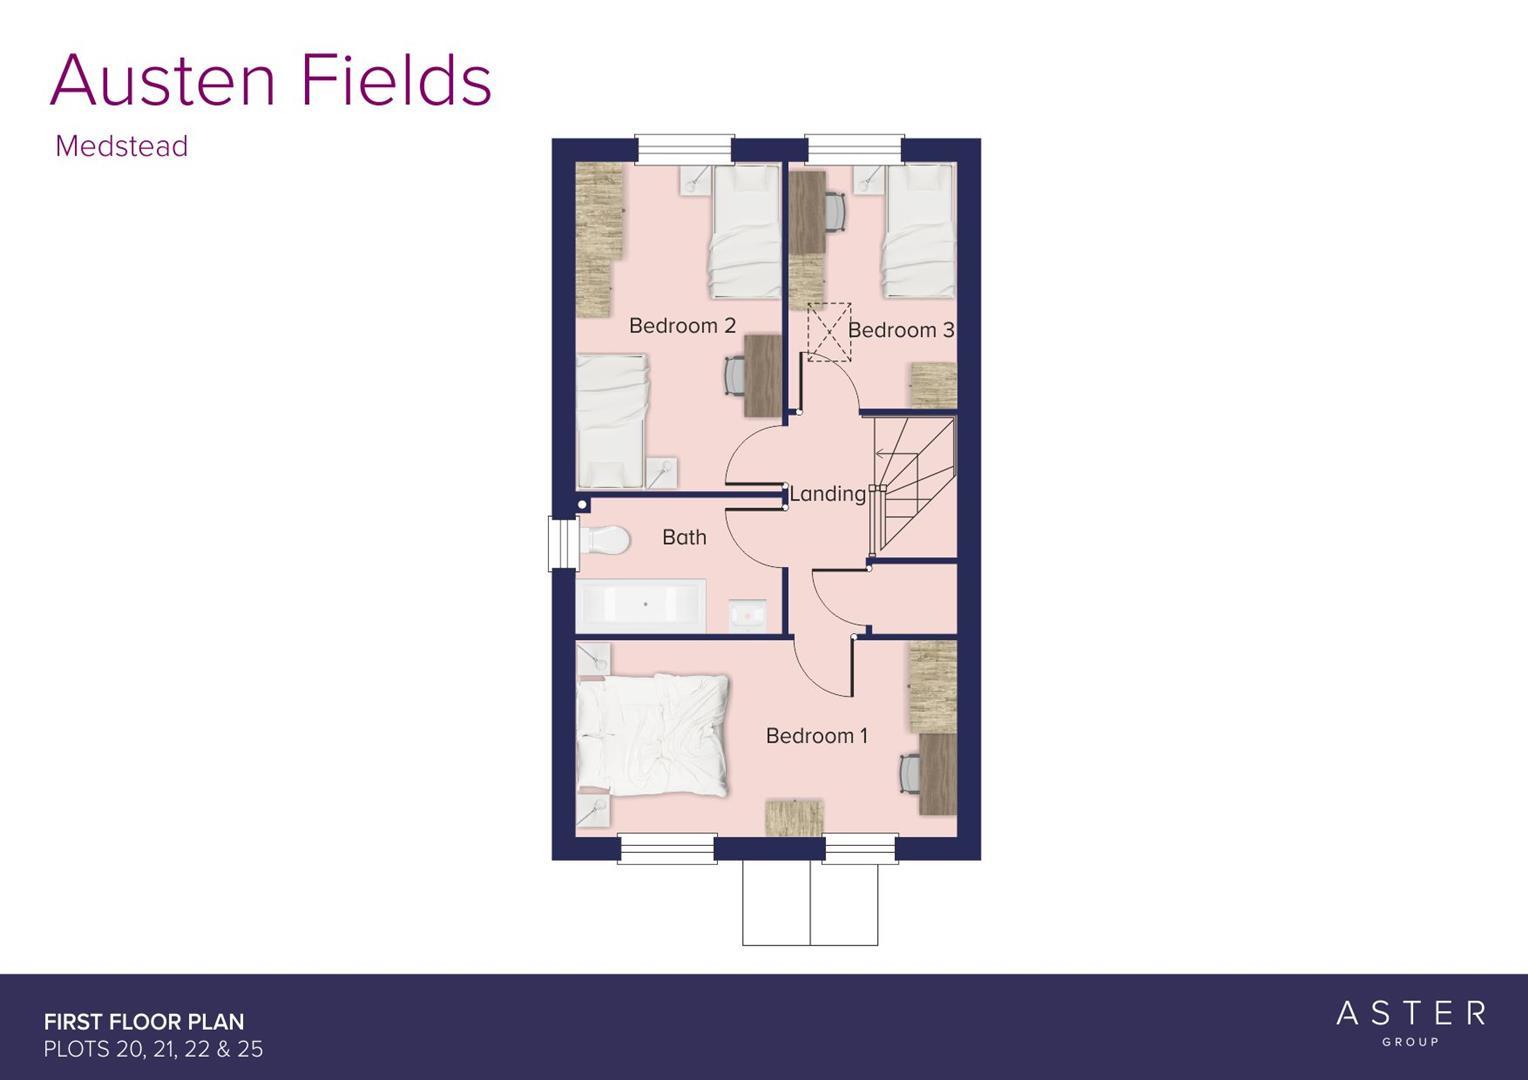 Austen Fields, Medstead_Plots 20, 21, 22 & 25_FF_F